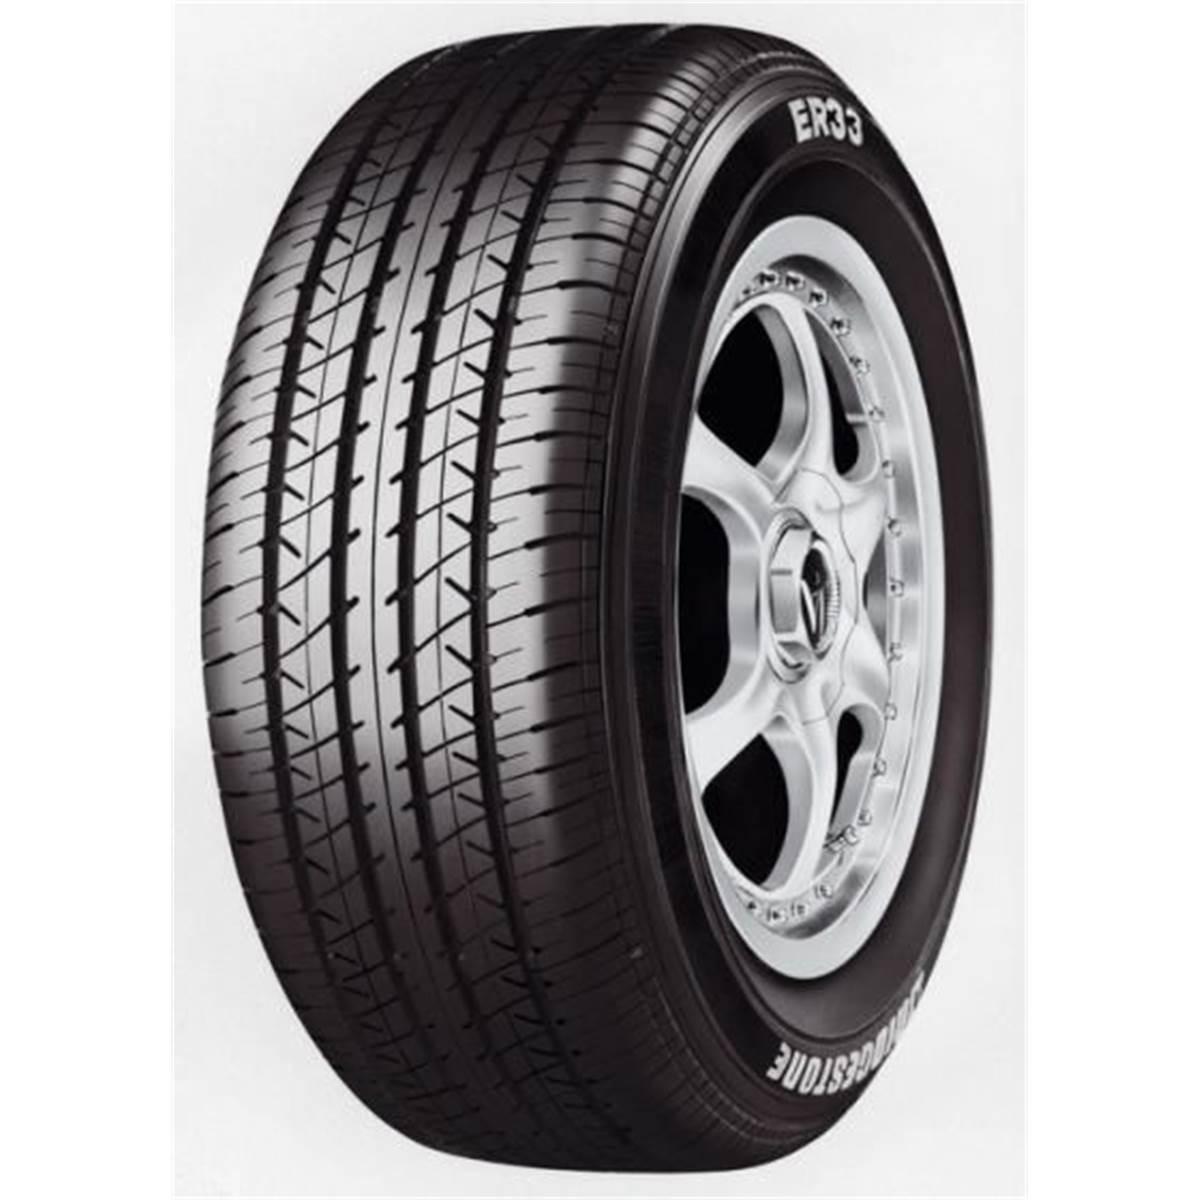 Pneu Bridgestone 225/50R17 94W Turanza Er33